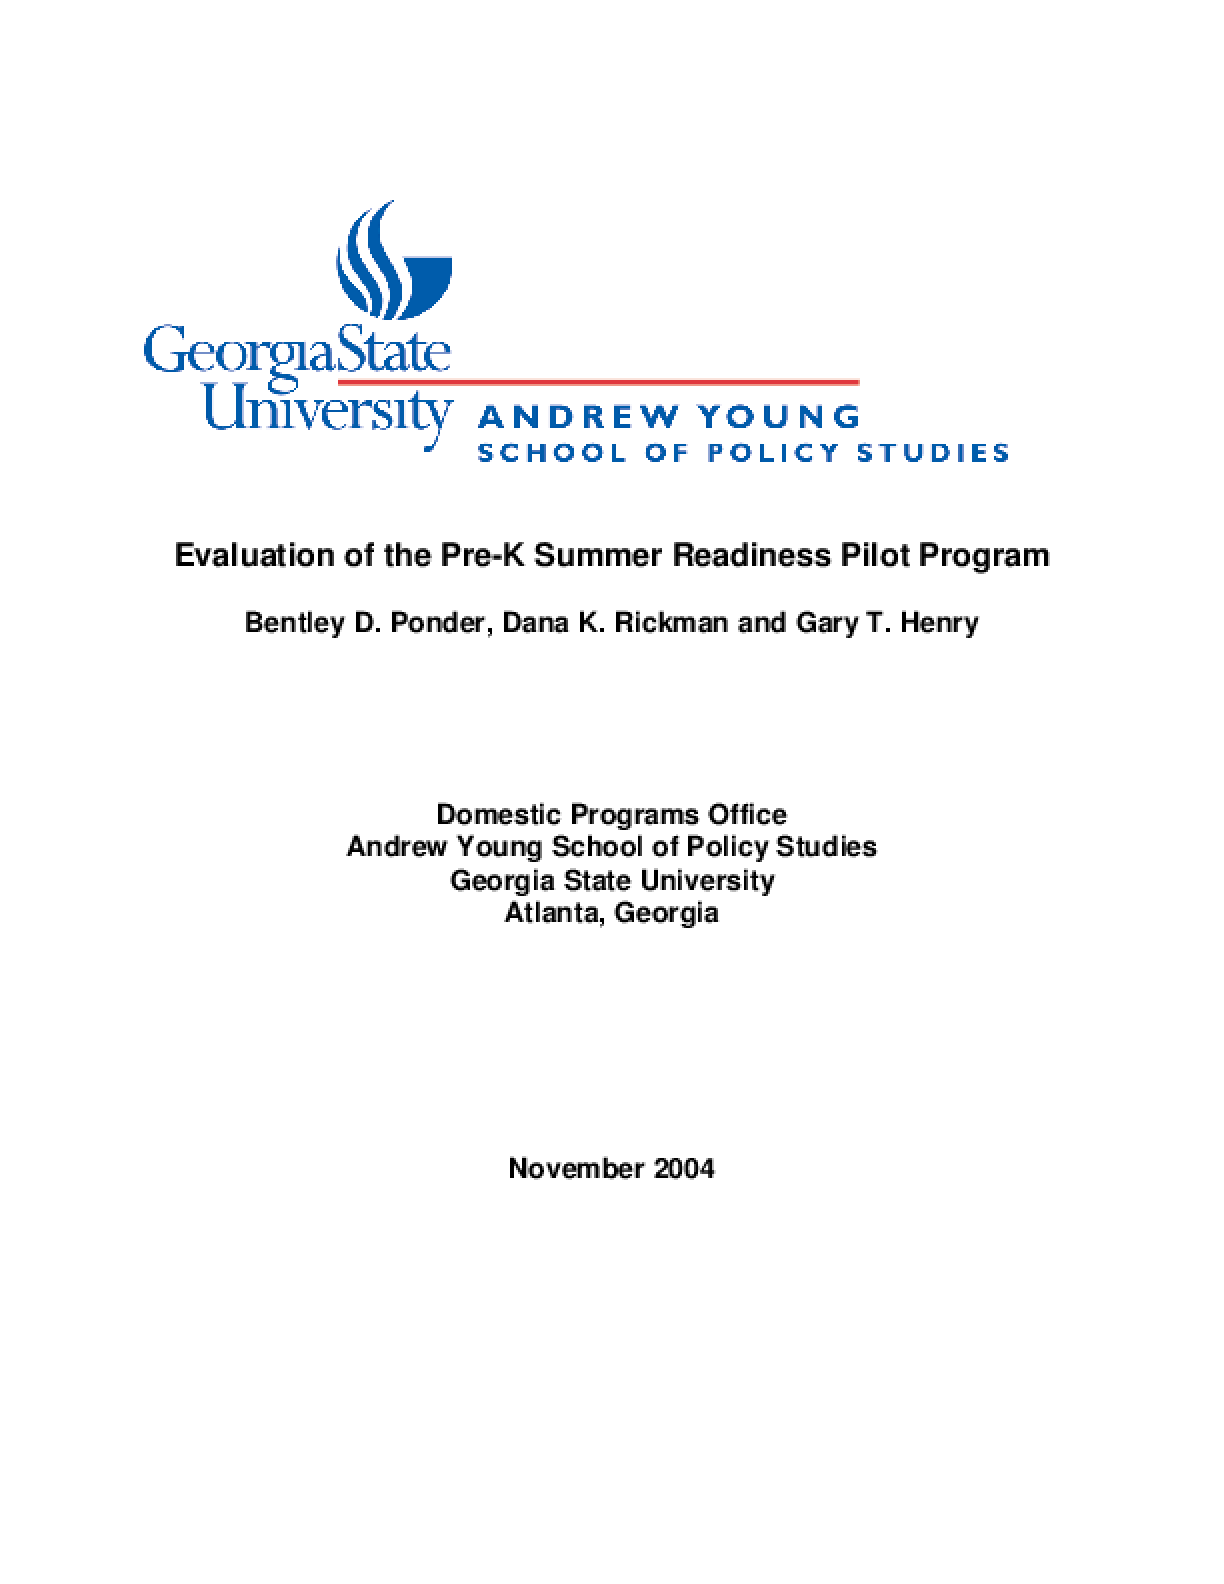 Evaluation of the Pre-K Summer Readiness Pilot Program